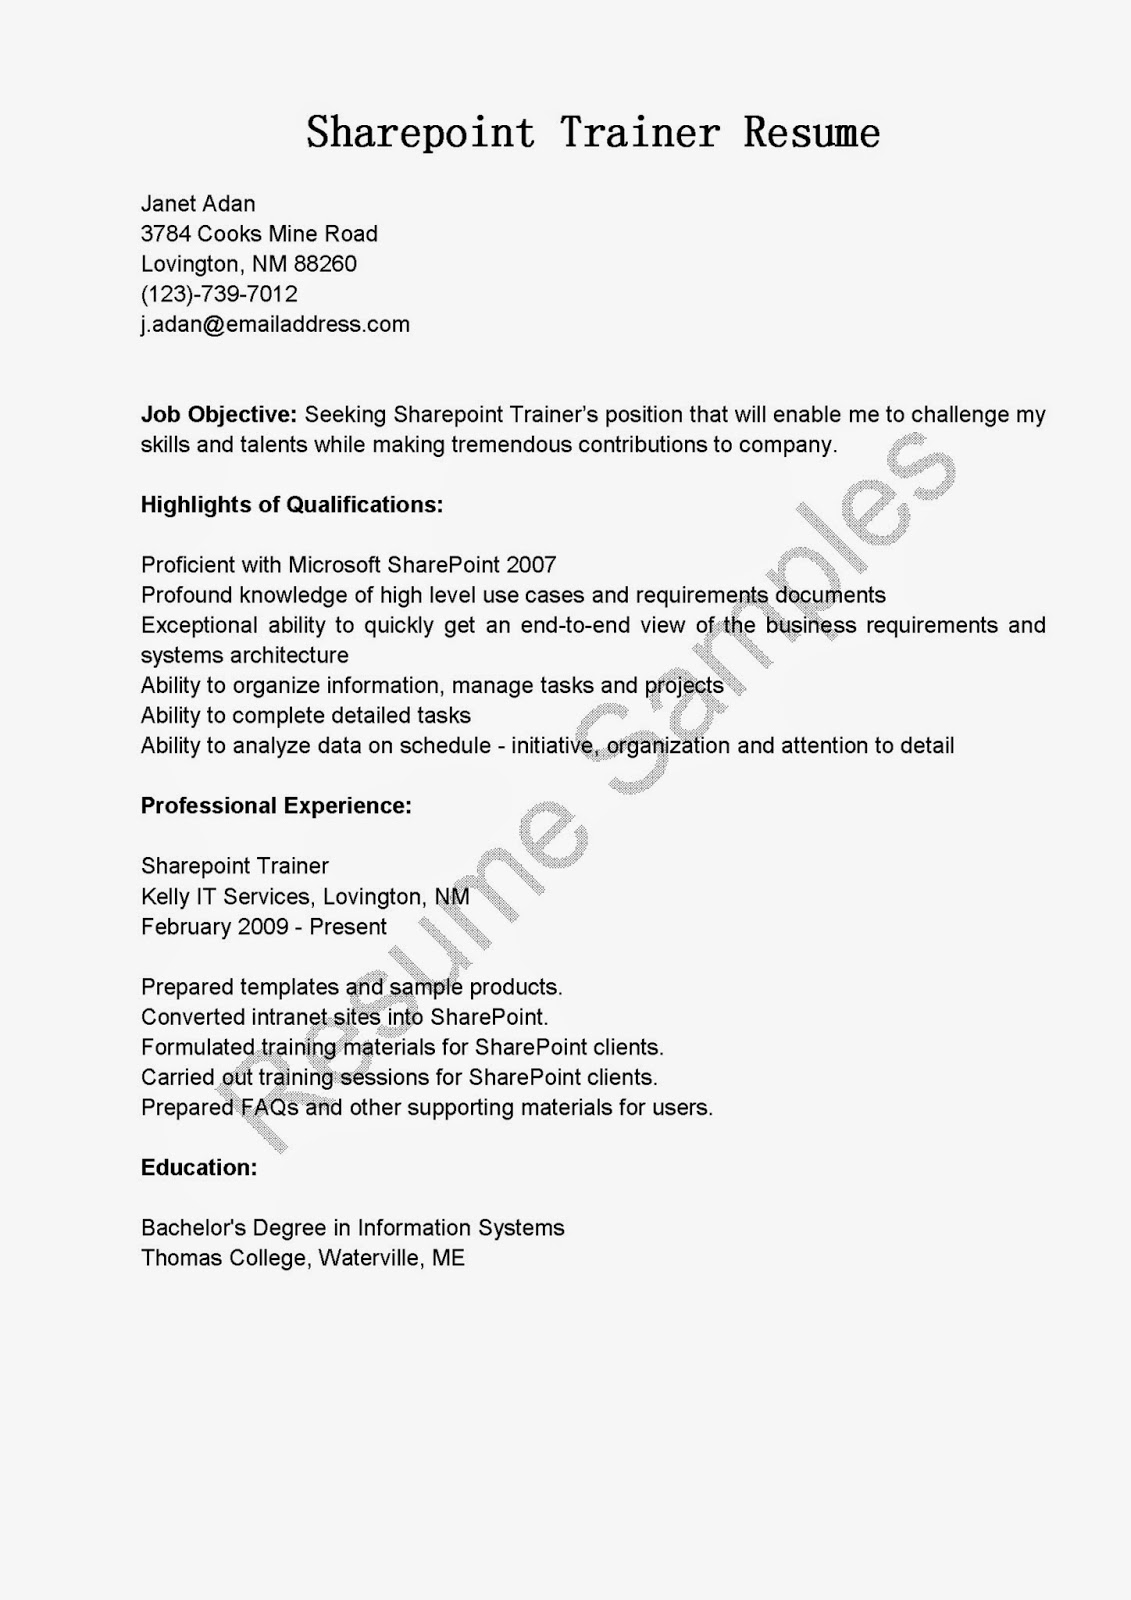 resume sles sharepoint trainer resume sle